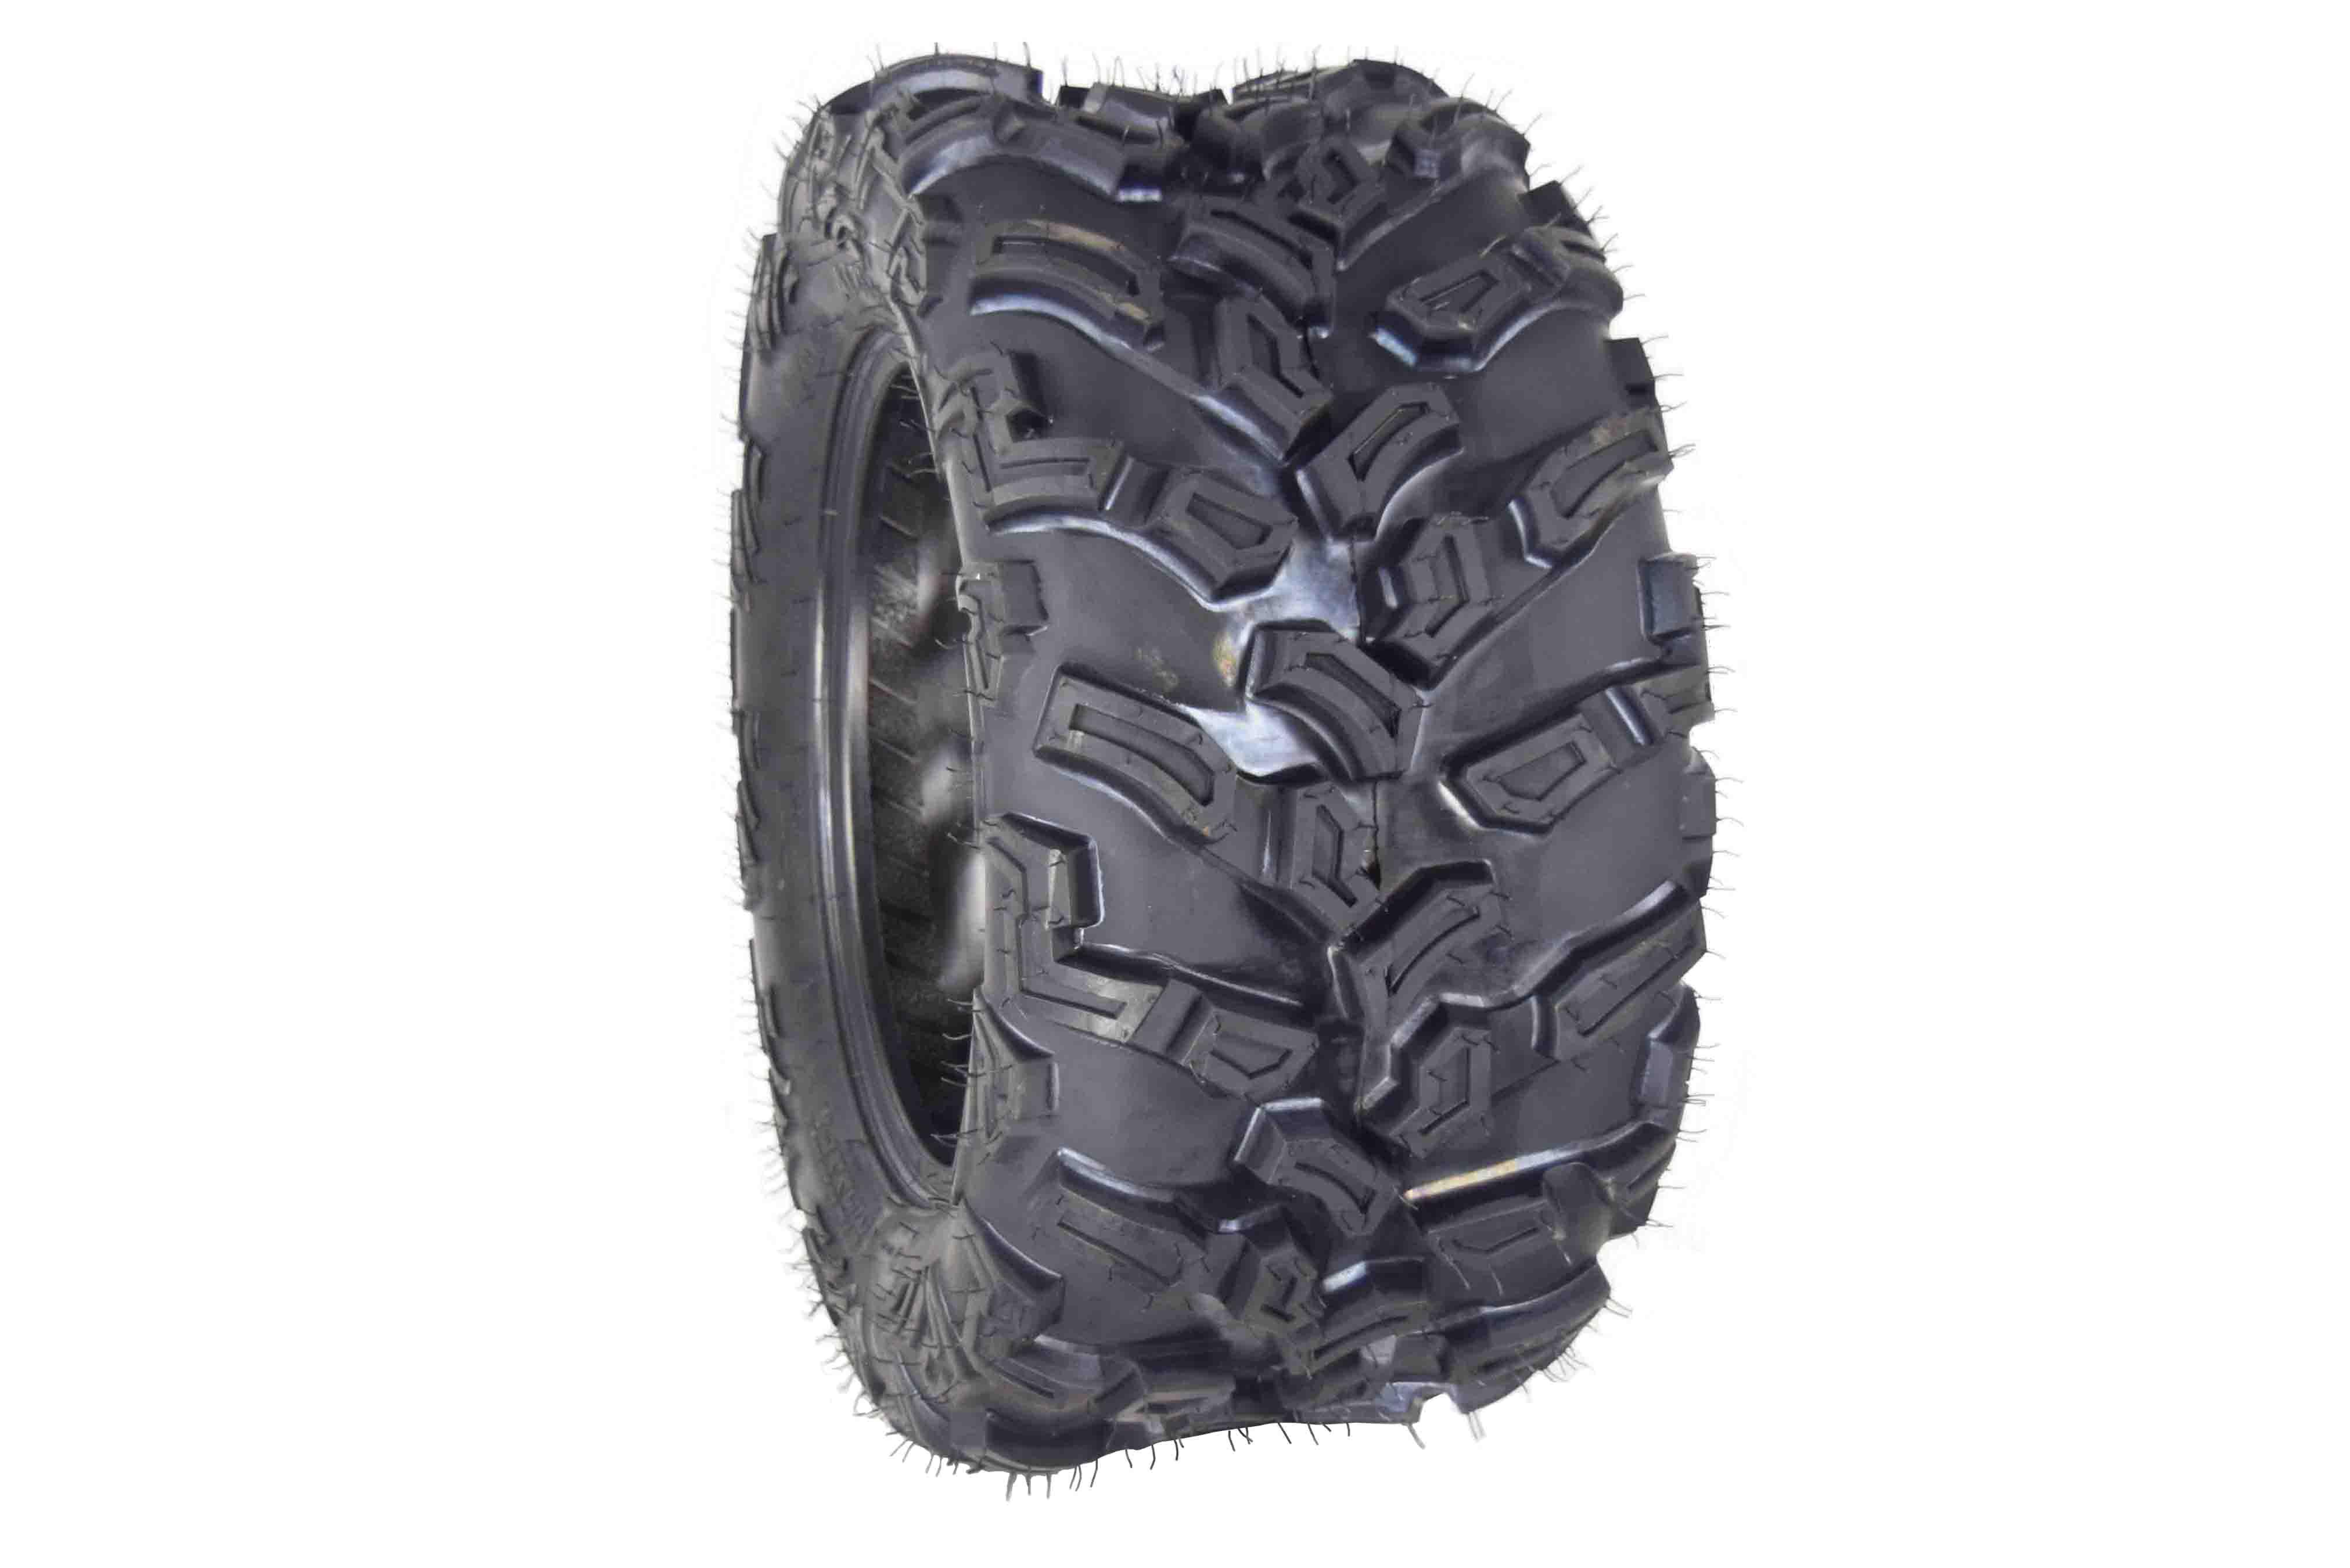 MASSFX  2 Set ATV Tires 26X11-14 Rear Durable Dual Compound 6 Ply 26X11x14